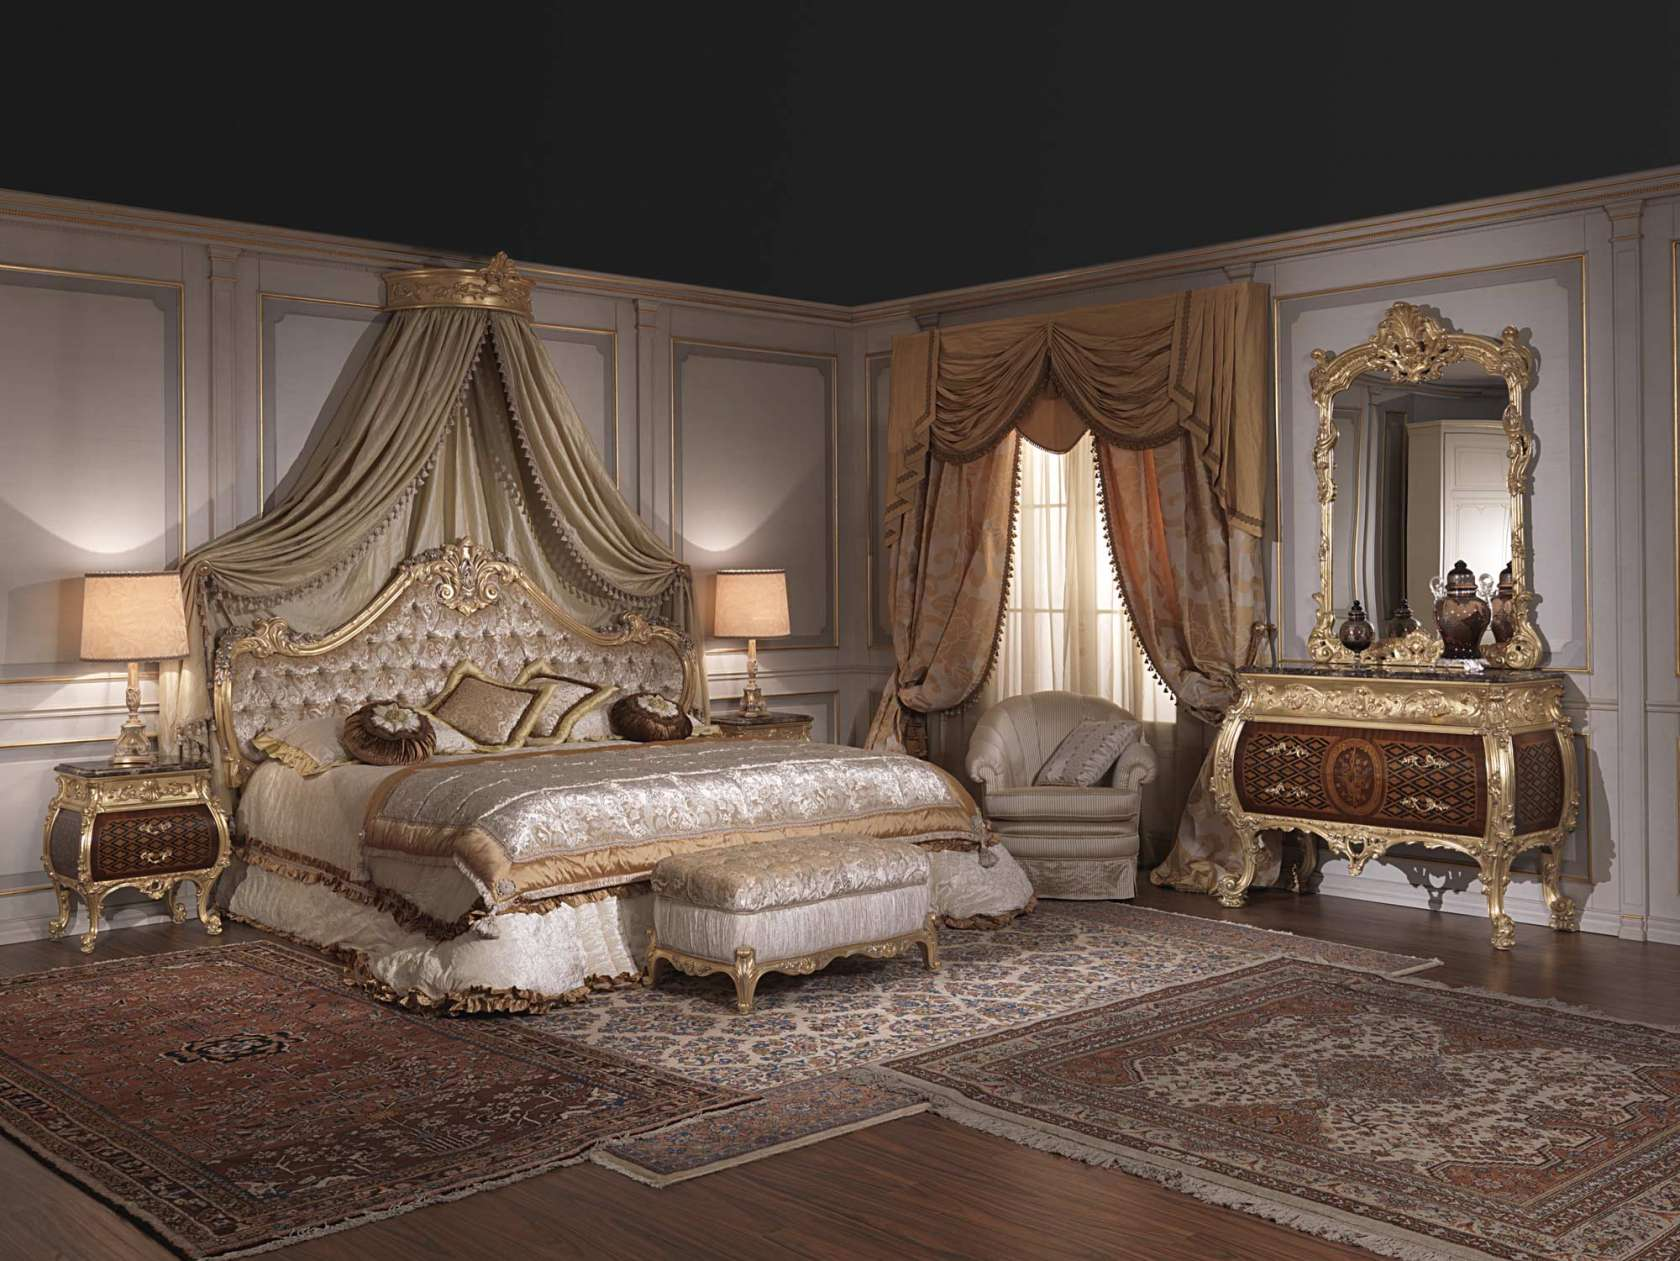 Luxury bedroom furniture European Furniture For Luxury Bedroom Emperador Gold Art 397931 Vimercati Classic Furniture Furniture For Luxury Bedroom Emperador Gold Art 397931 Vimercati